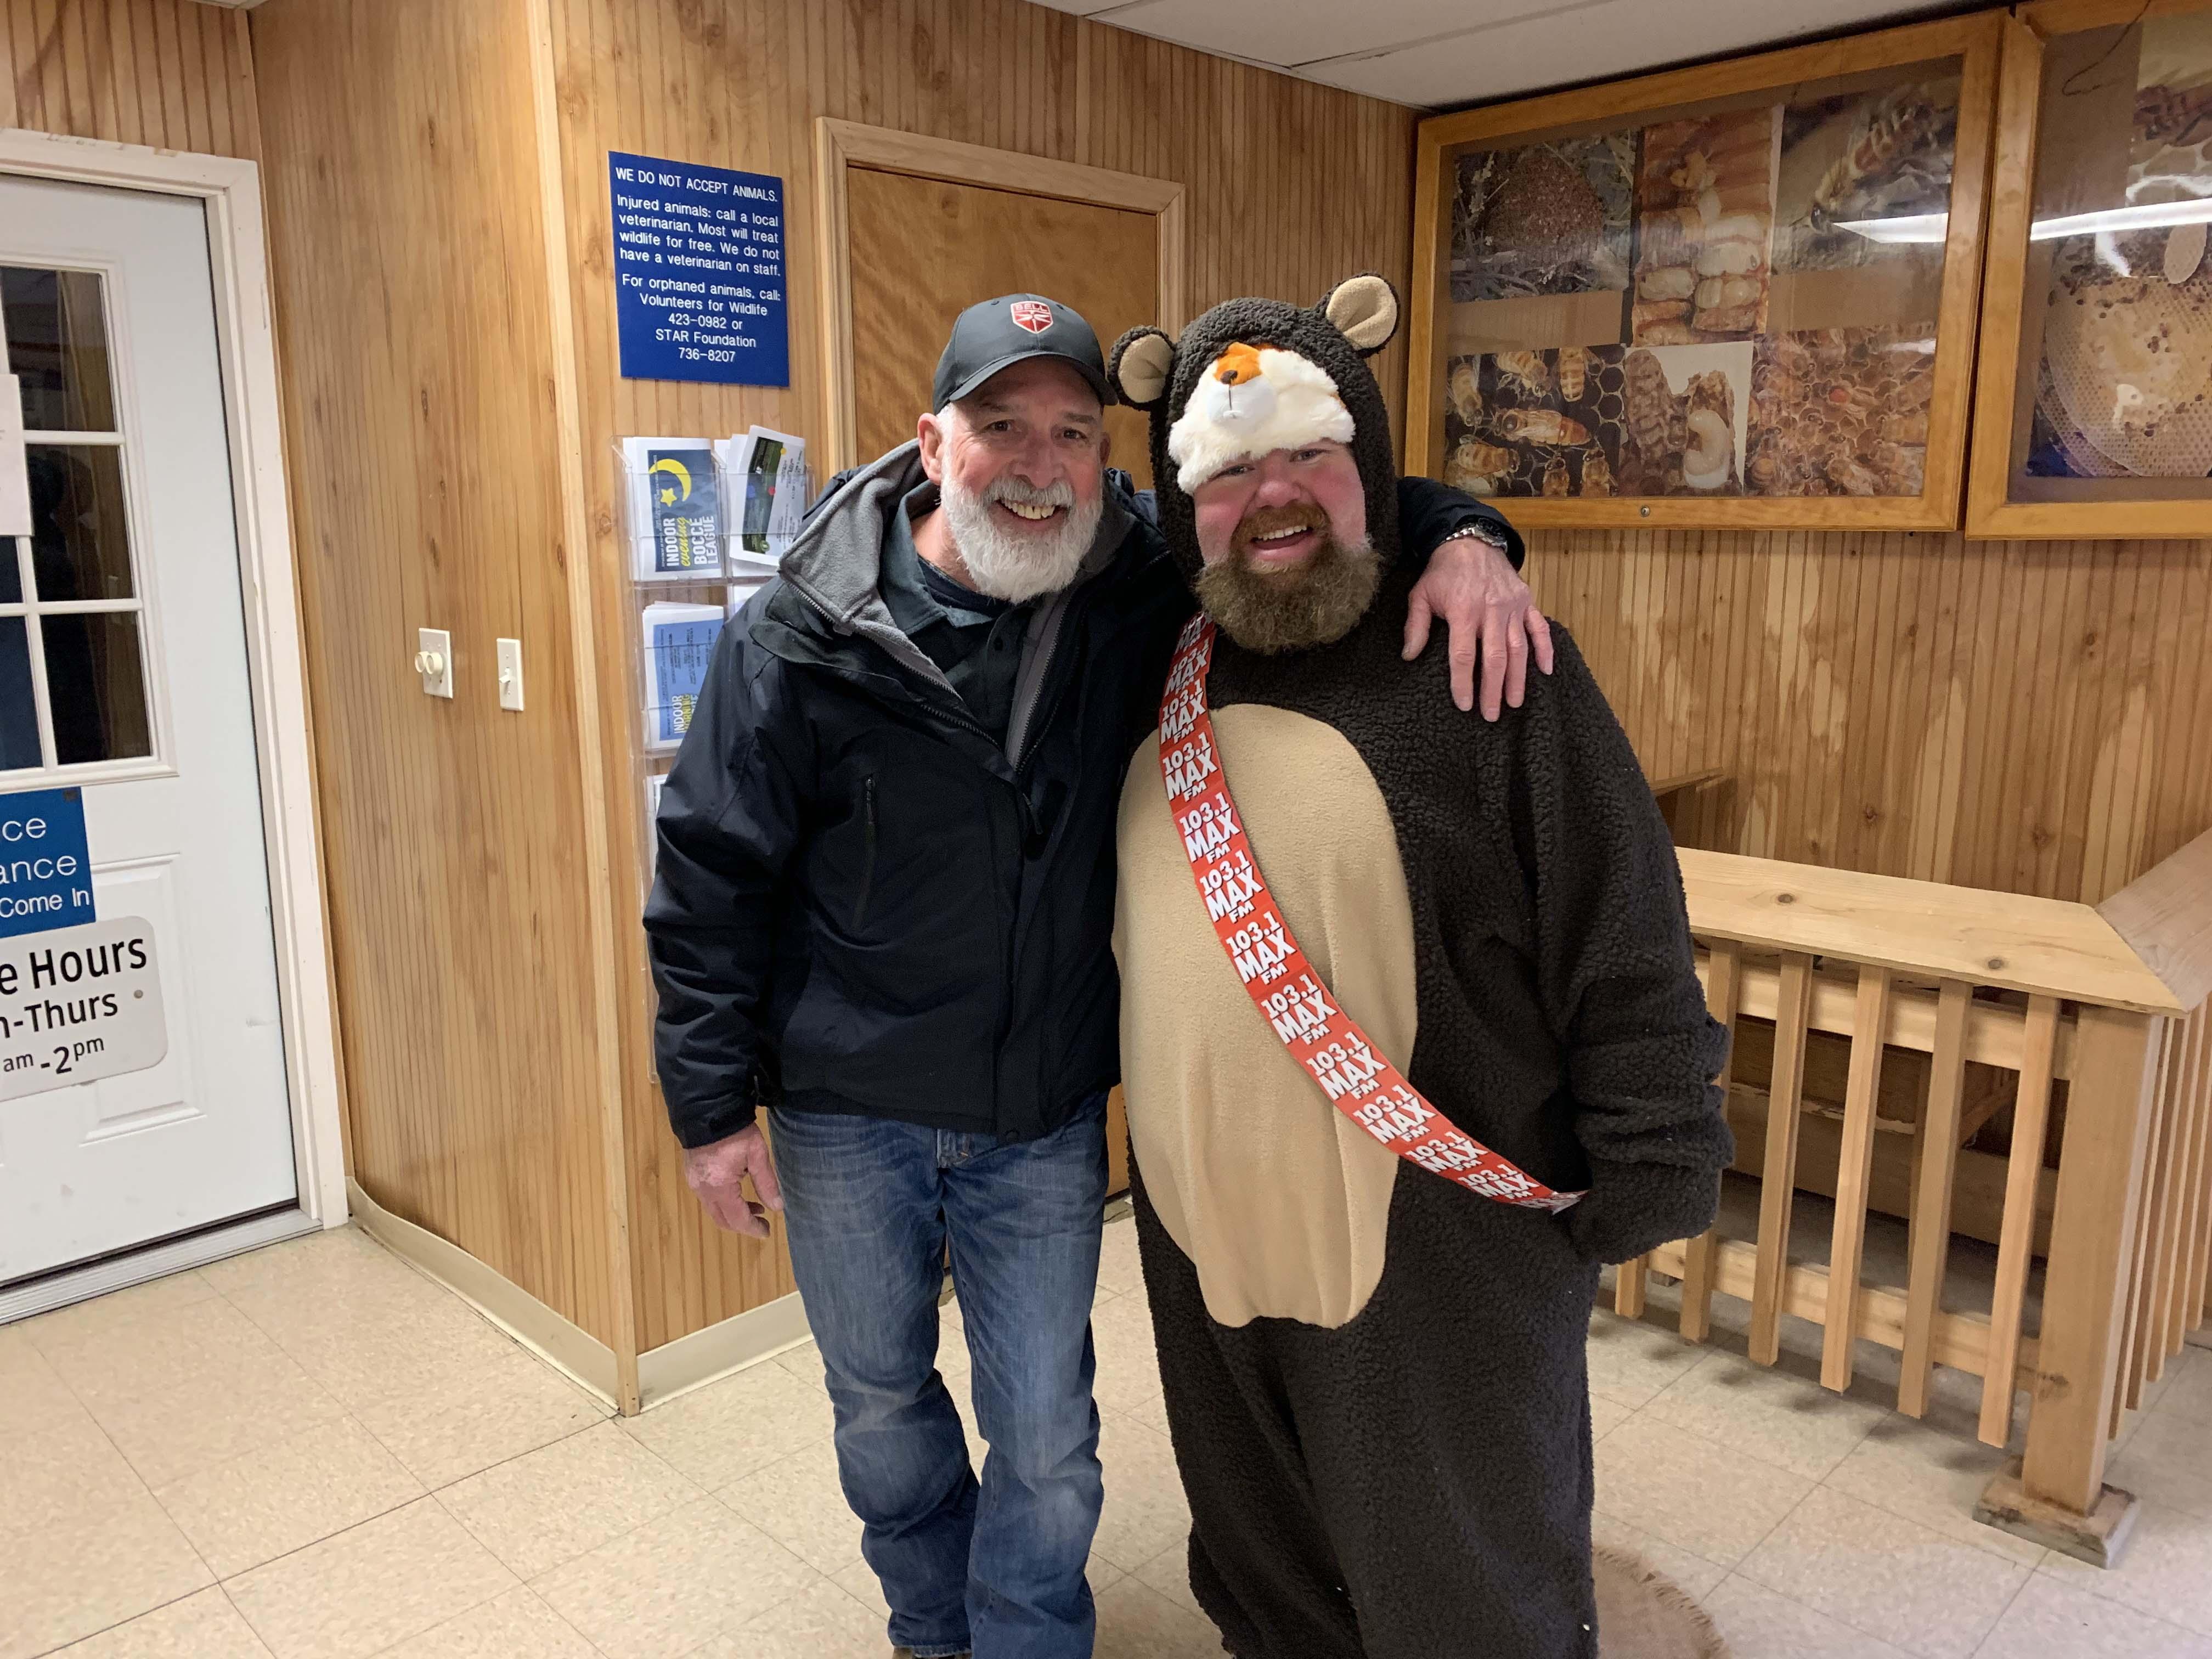 103.1 MAX FM at Hostville Groundhogs day